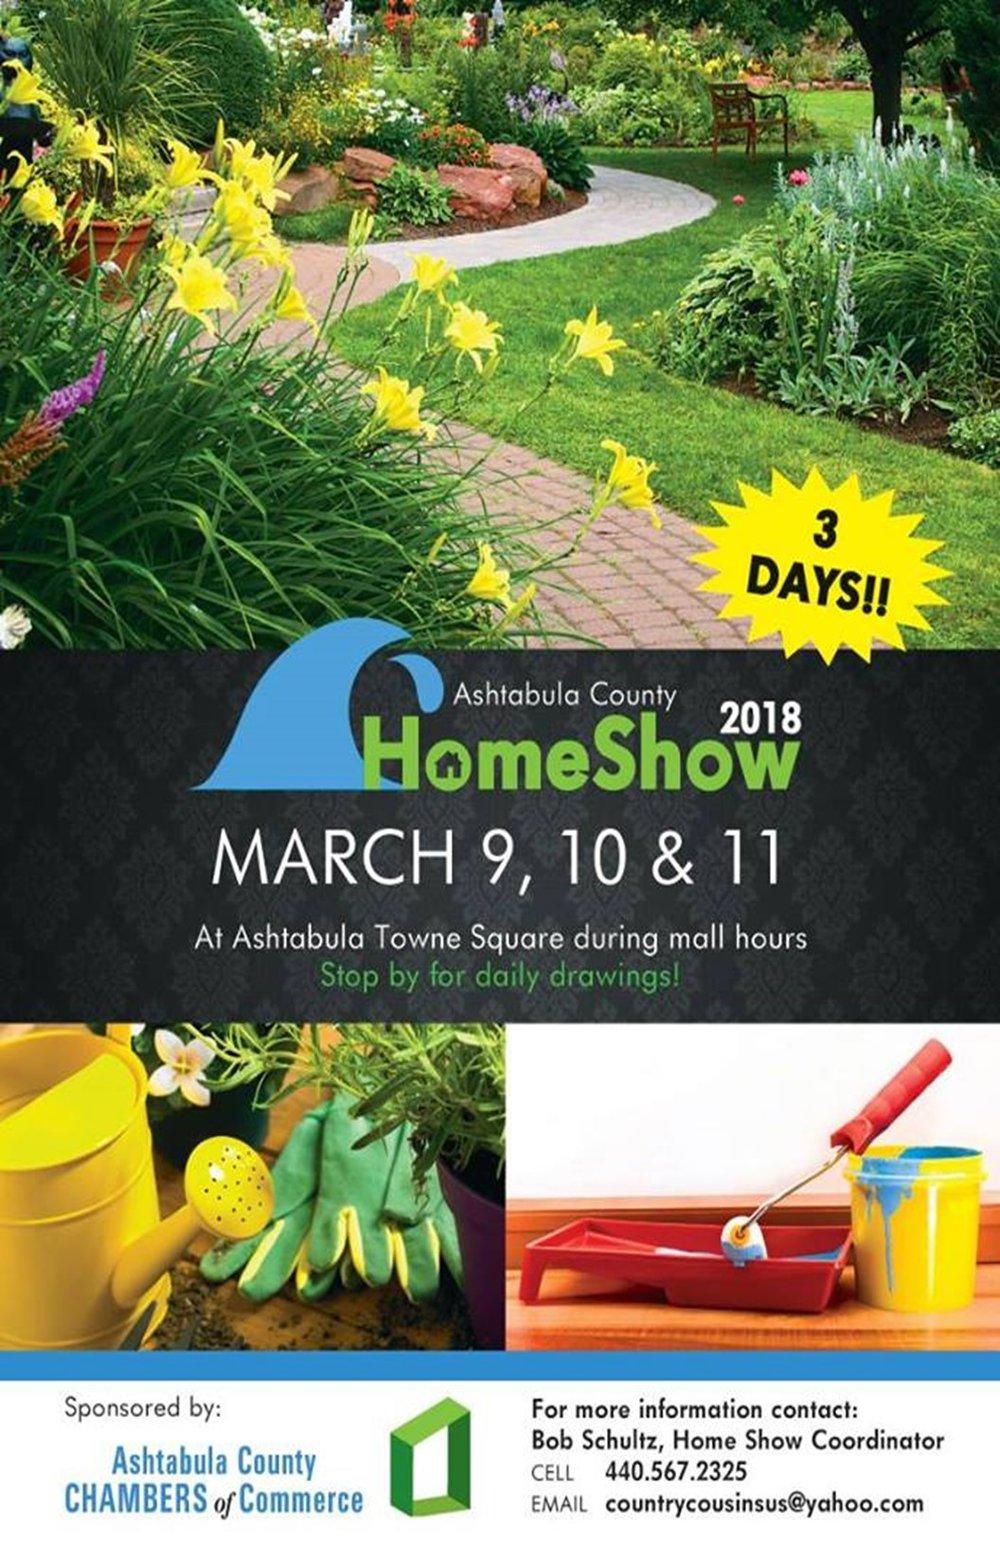 2018 Homeshow POSTER Jpeg.jpg